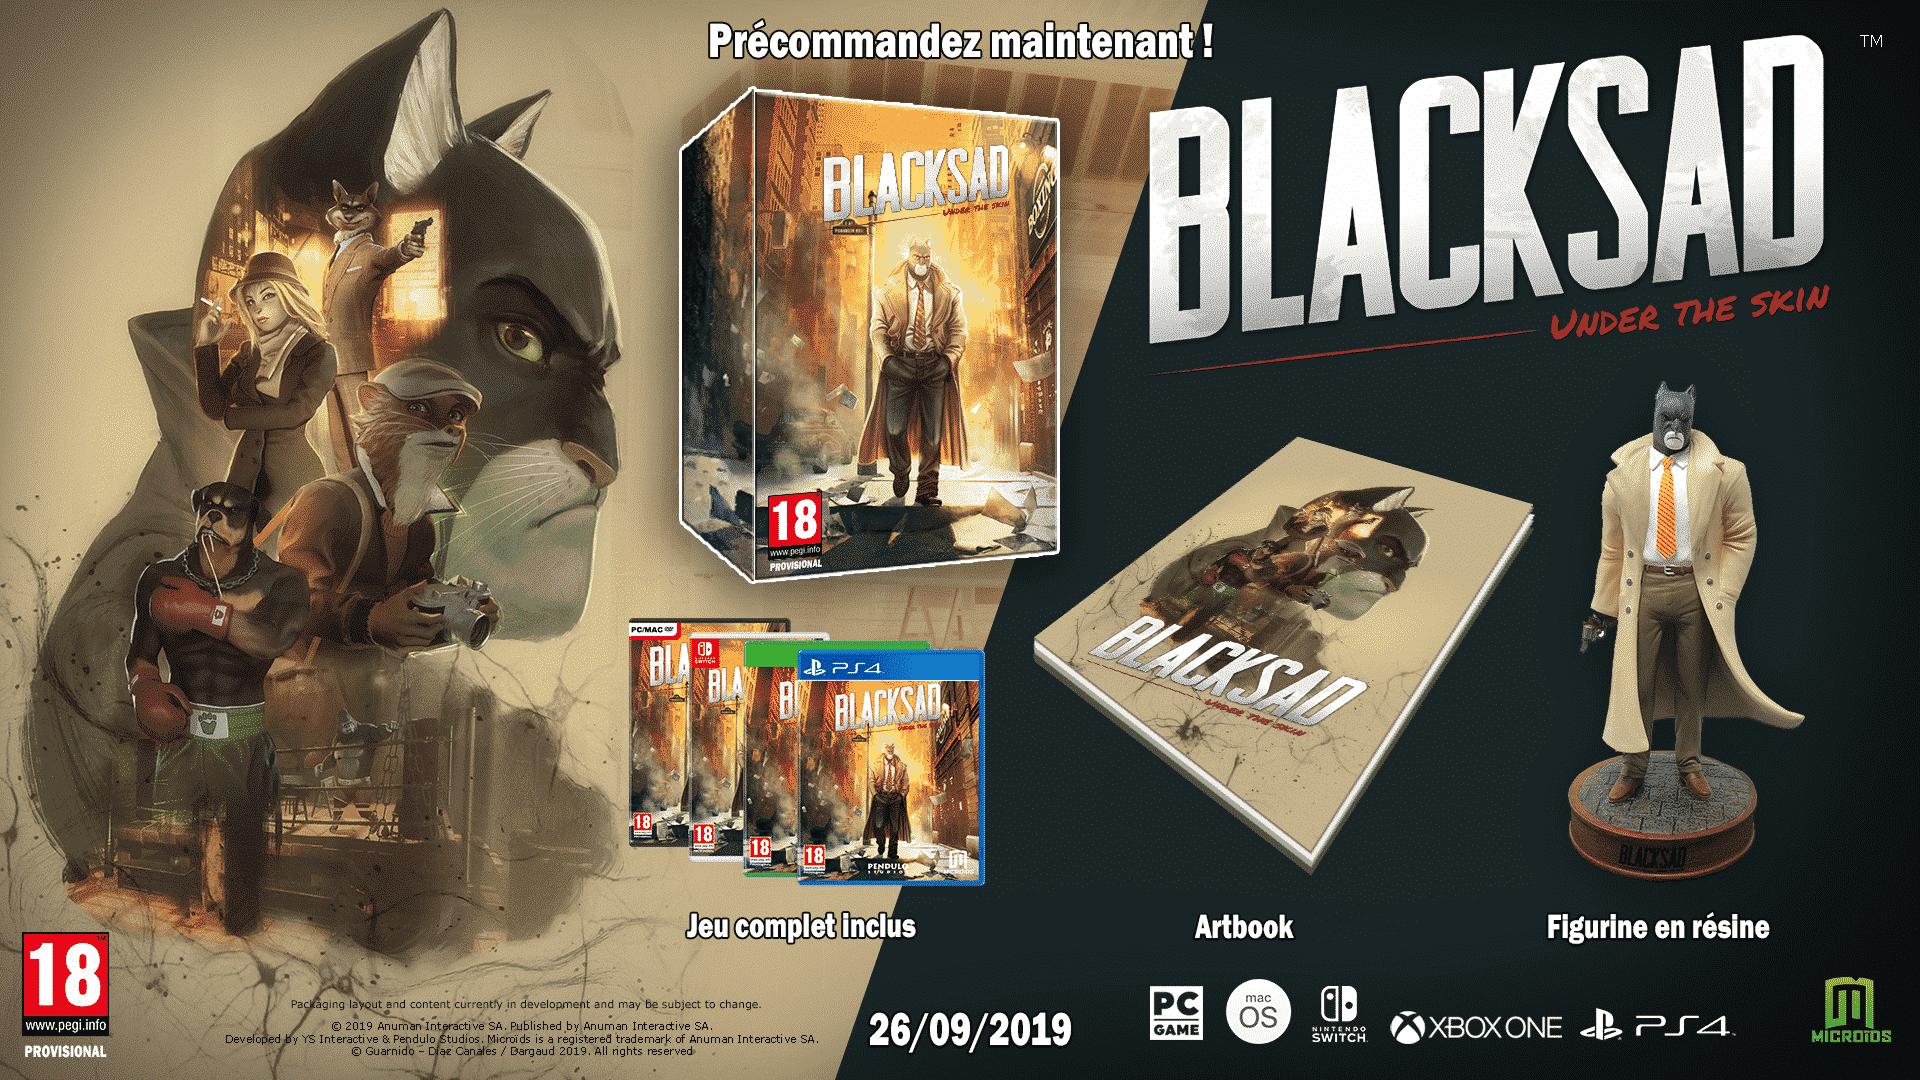 Blacksad en jeu vidéo (Microids et Pendulo Studios - 2019)